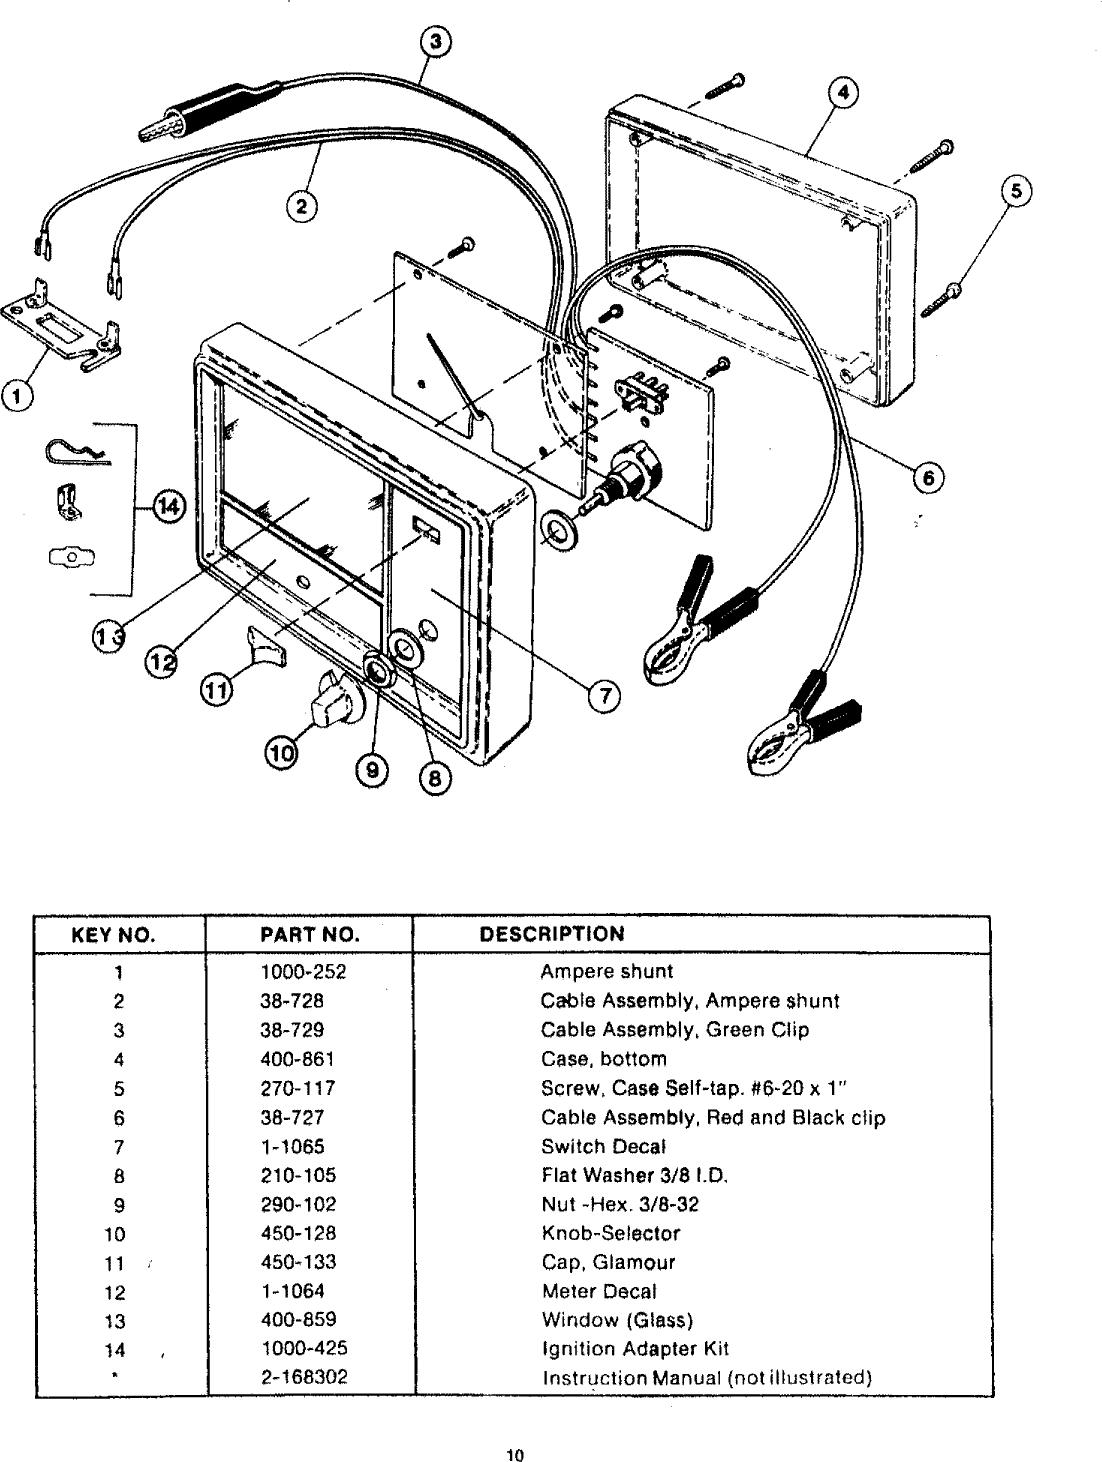 Array curb wiring diagram toyota user manuals rh curb wiring diagram toyota user manuals 25for